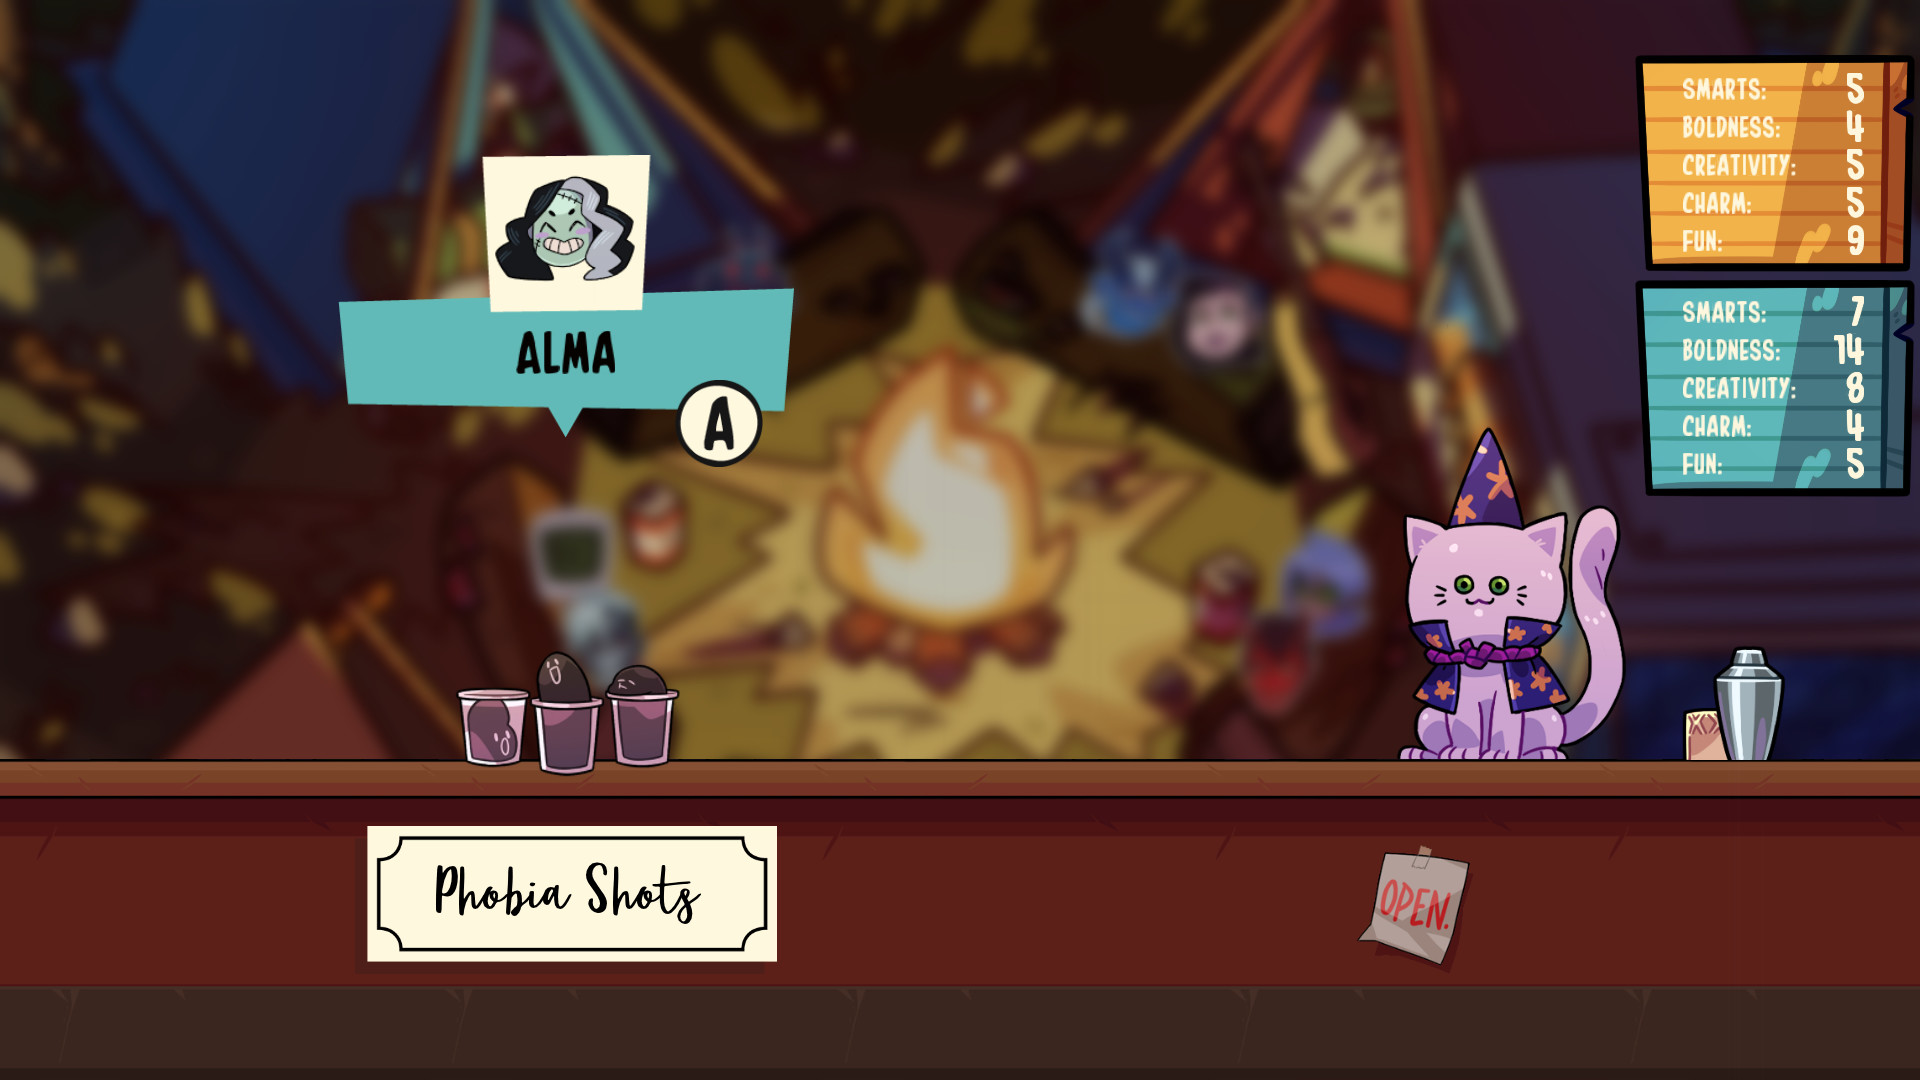 monster-prom-2-monster-camp-pc-screenshot-03